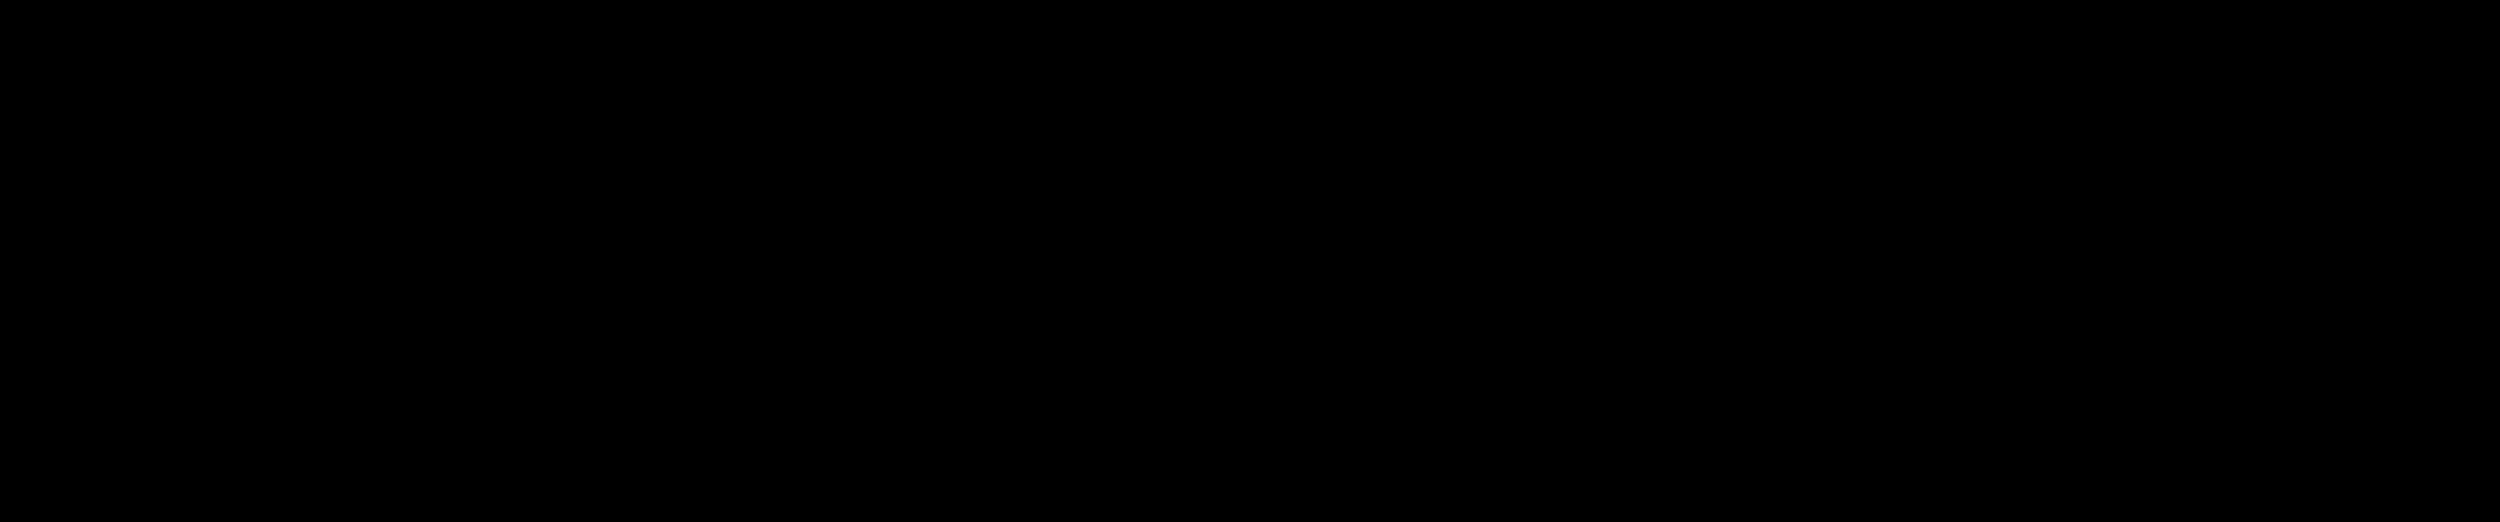 FedericoRolon_Logo._layout_Agent Brand Black.png